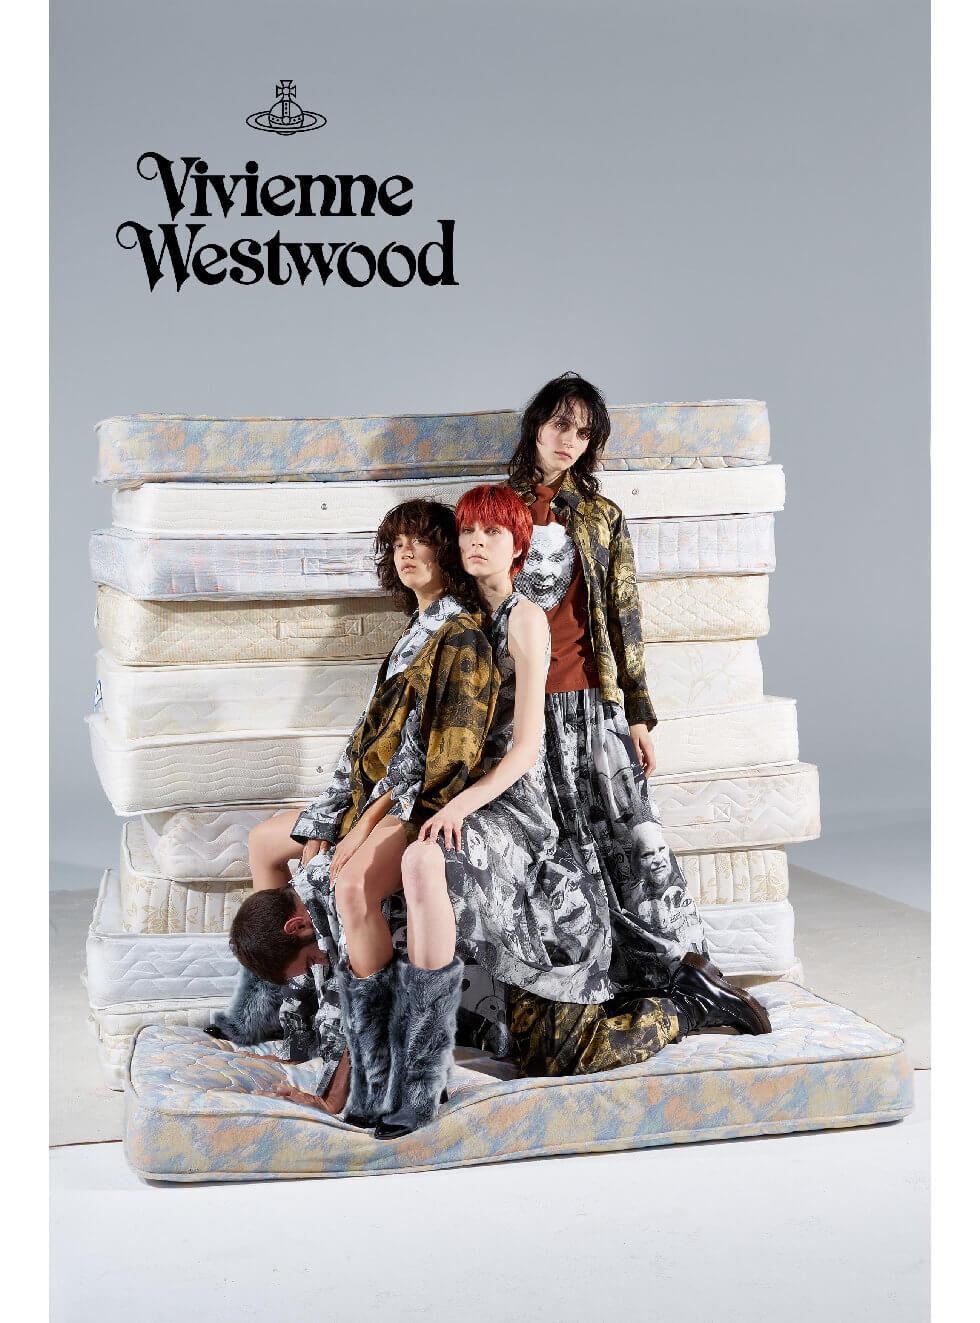 Vivienne Westwood A/W 2018. Fotografía: Vivienne Westwood